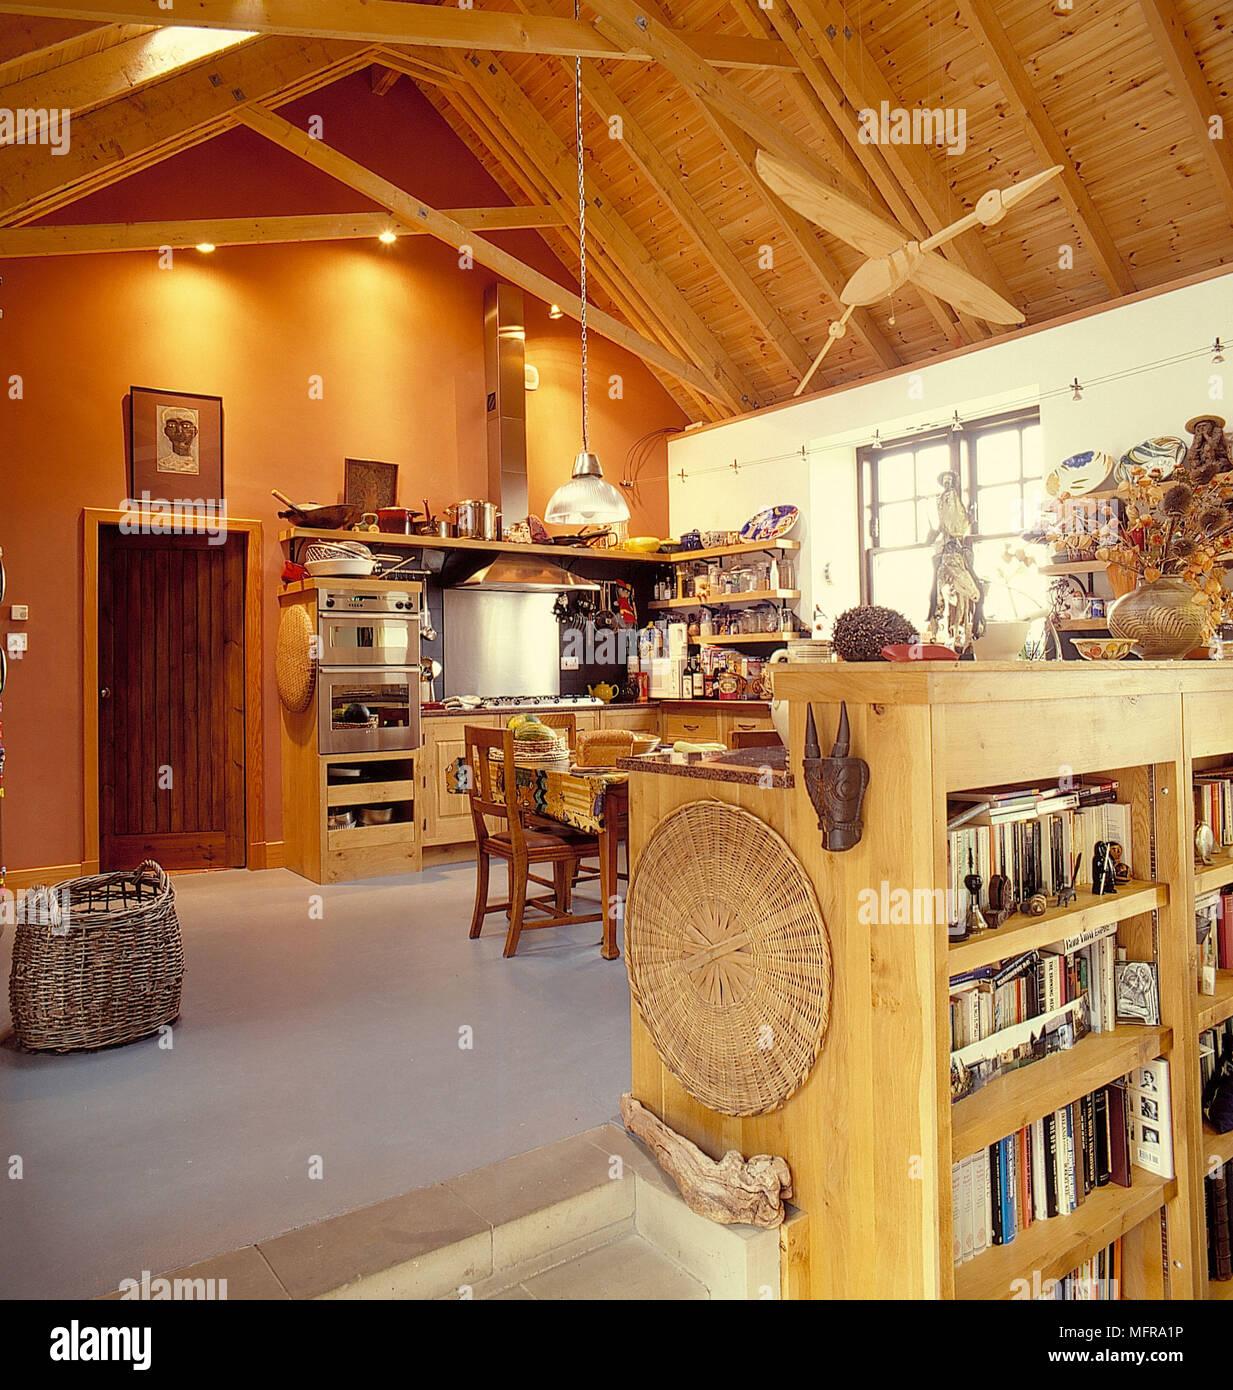 Sloping Ceiling Kitchen Stockfotos & Sloping Ceiling Kitchen Bilder ...